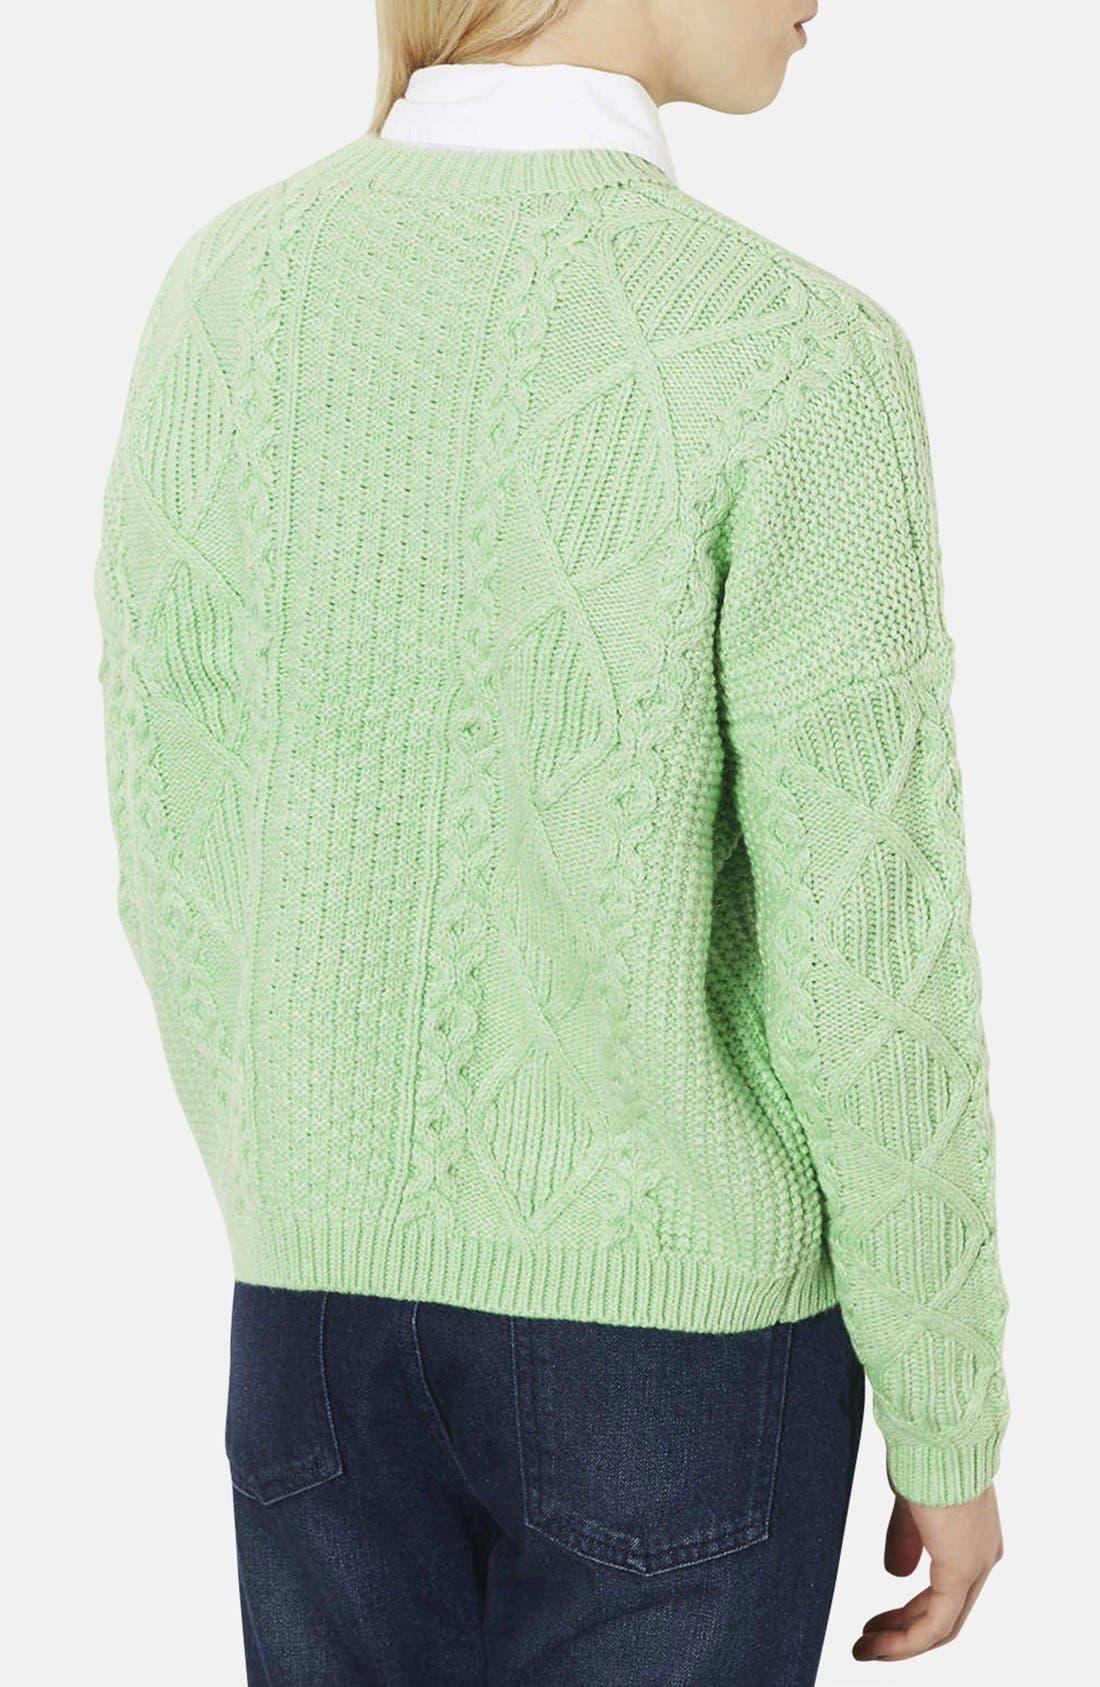 TOPSHOP, Crewneck Cable Knit Sweater, Alternate thumbnail 3, color, 340